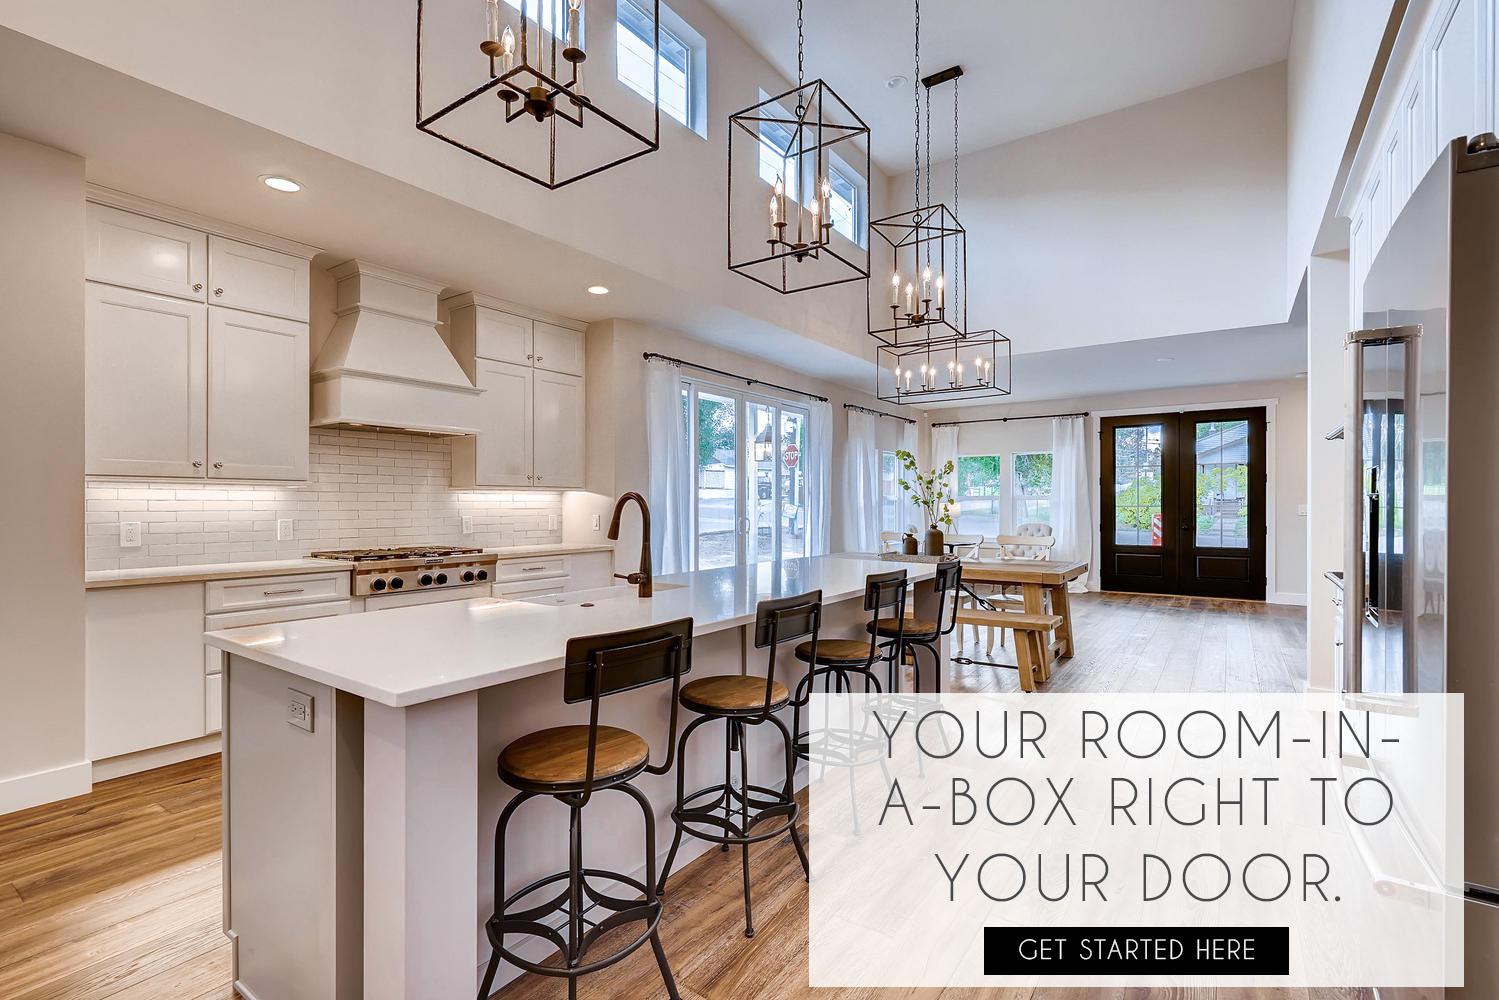 Postbox-Designs-Online-Interior-Design-Services-E-Design